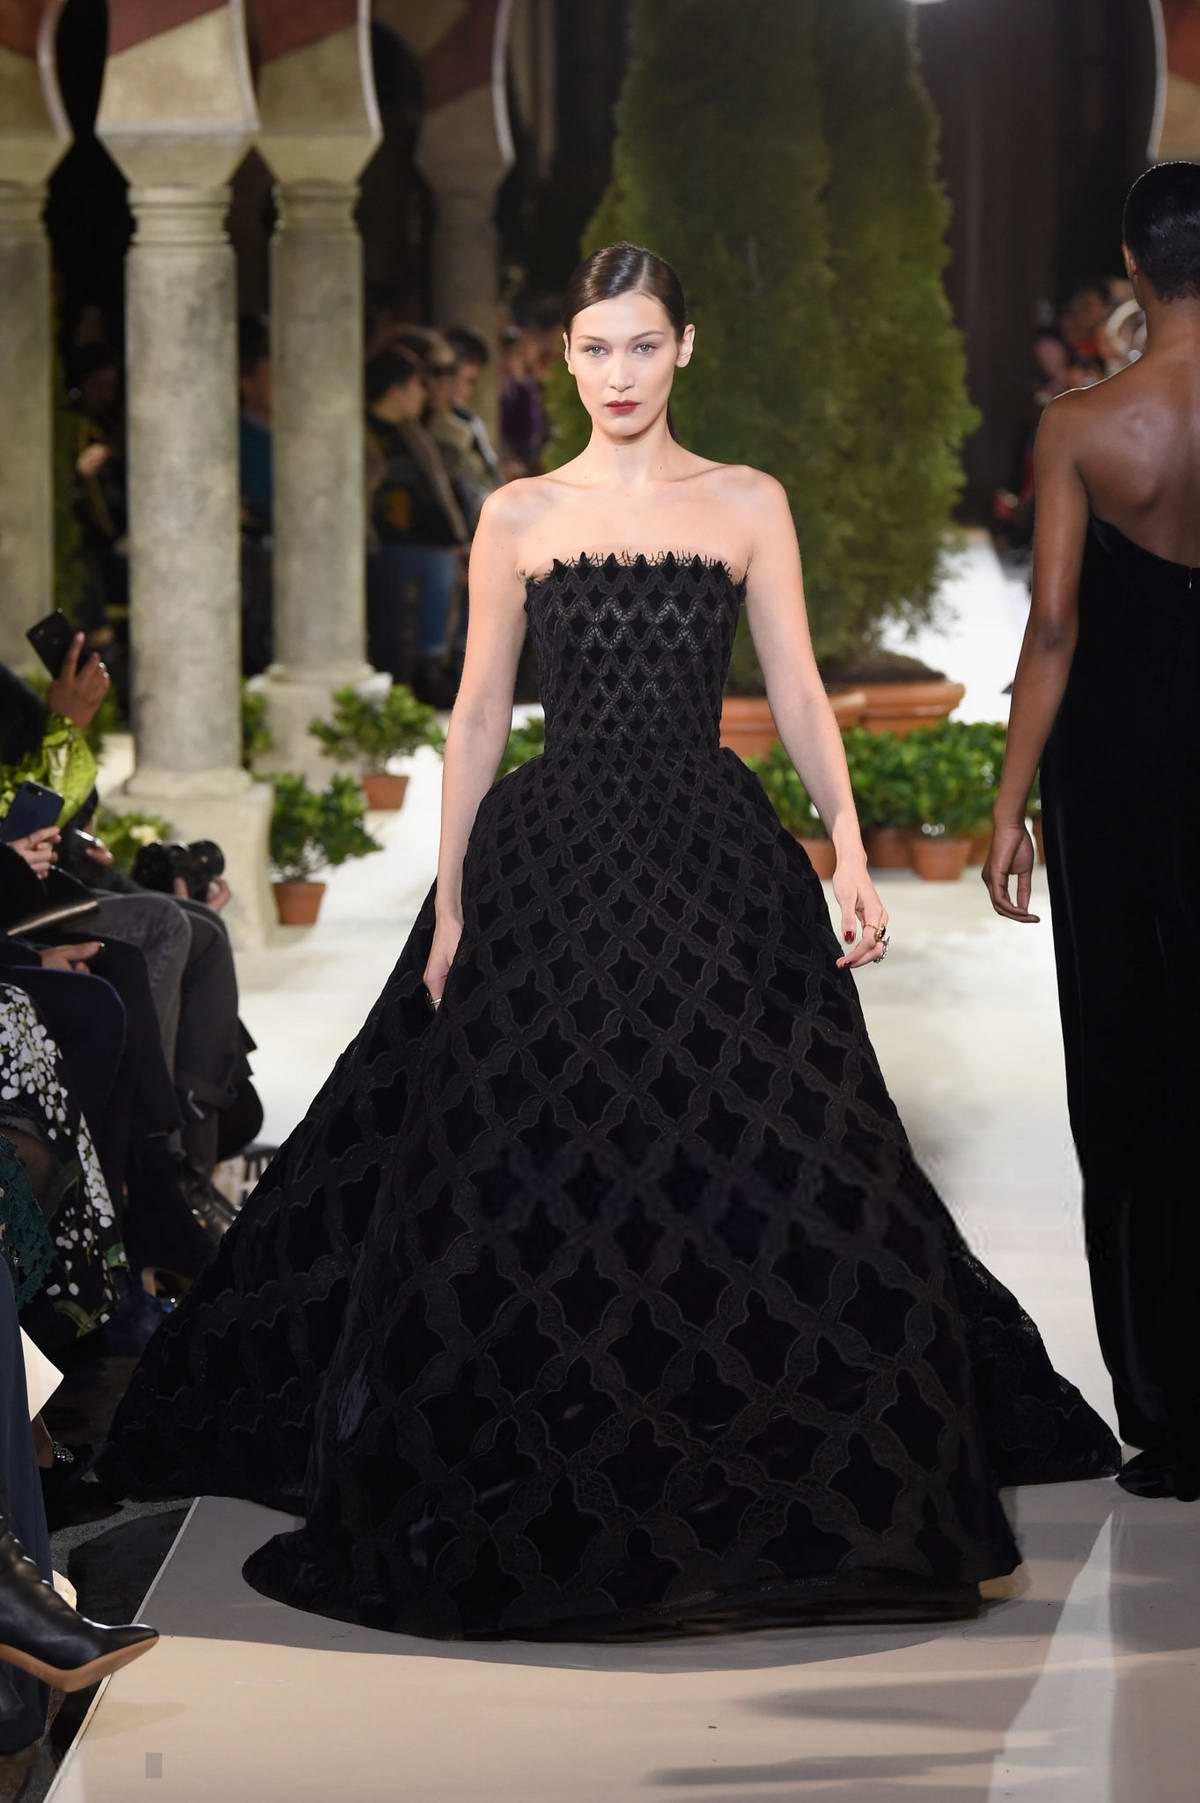 Bella Hadid walks the runway at Oscar De La Renta show during New York Fashion Week in New York City